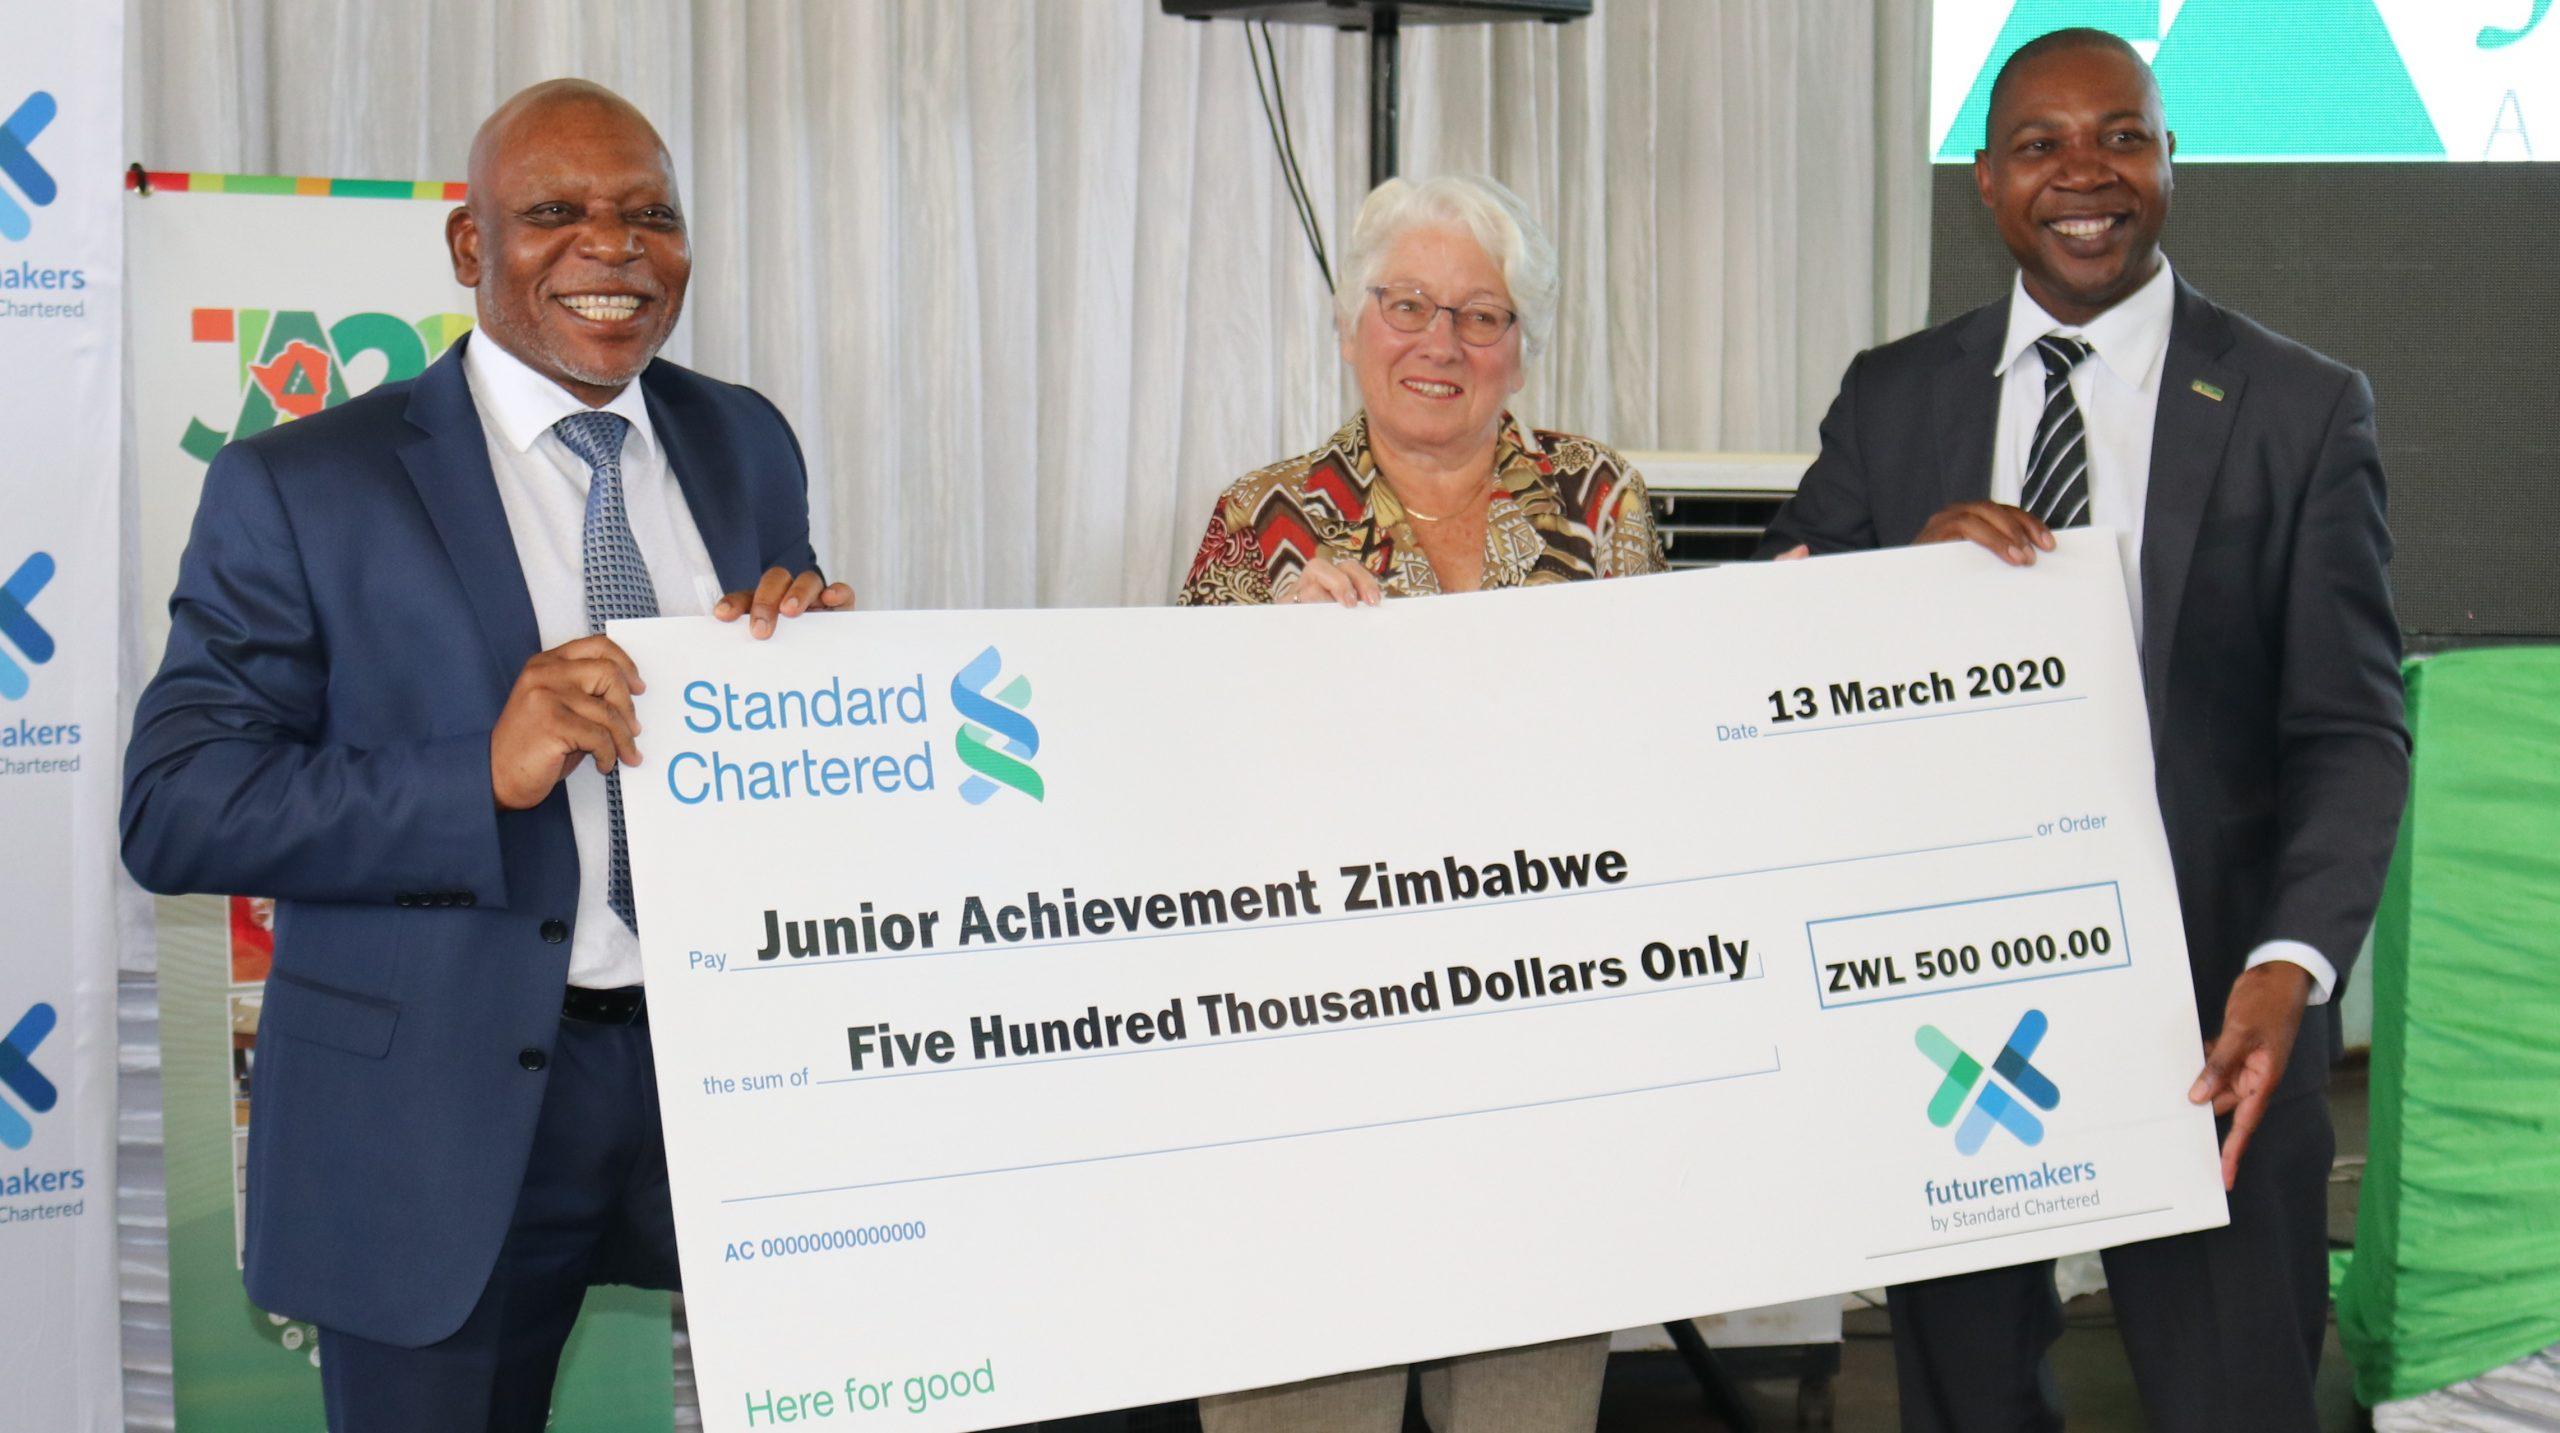 Standard Chartered Zimbabwe launches 'Future Makers'